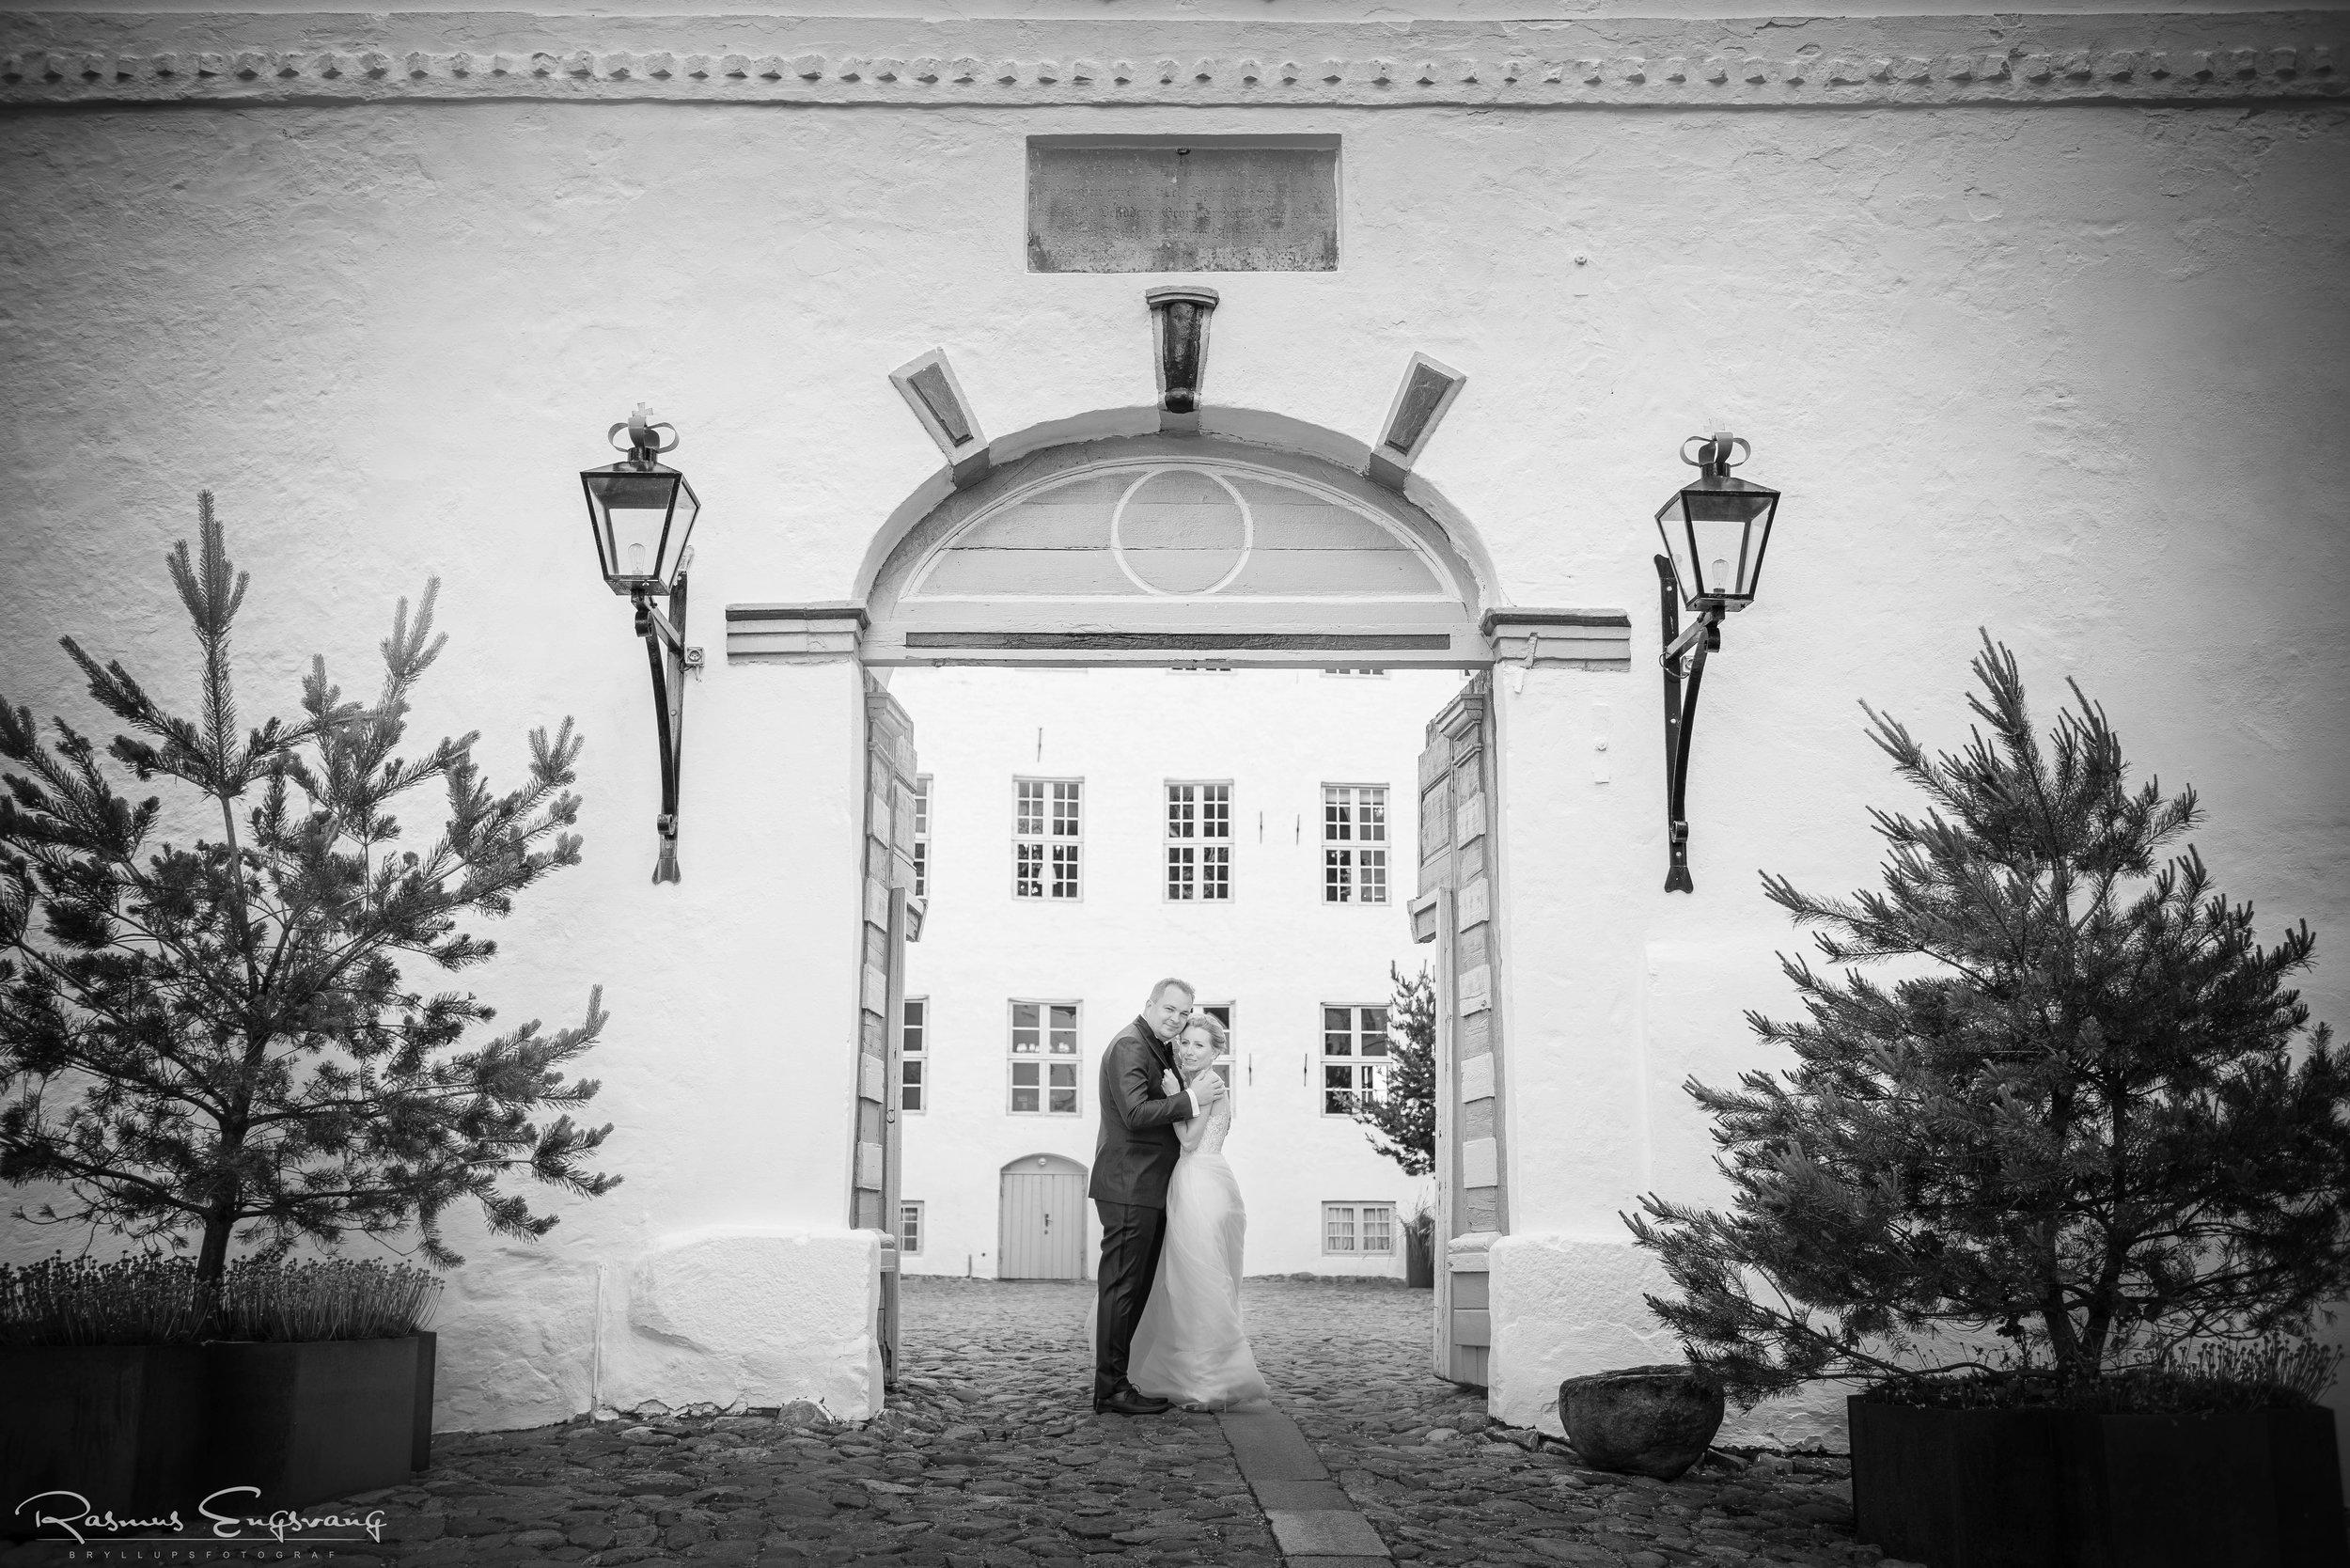 Dragsholm_Slot_Slotsbryllup_Bryllupsfotograf-417.jpg